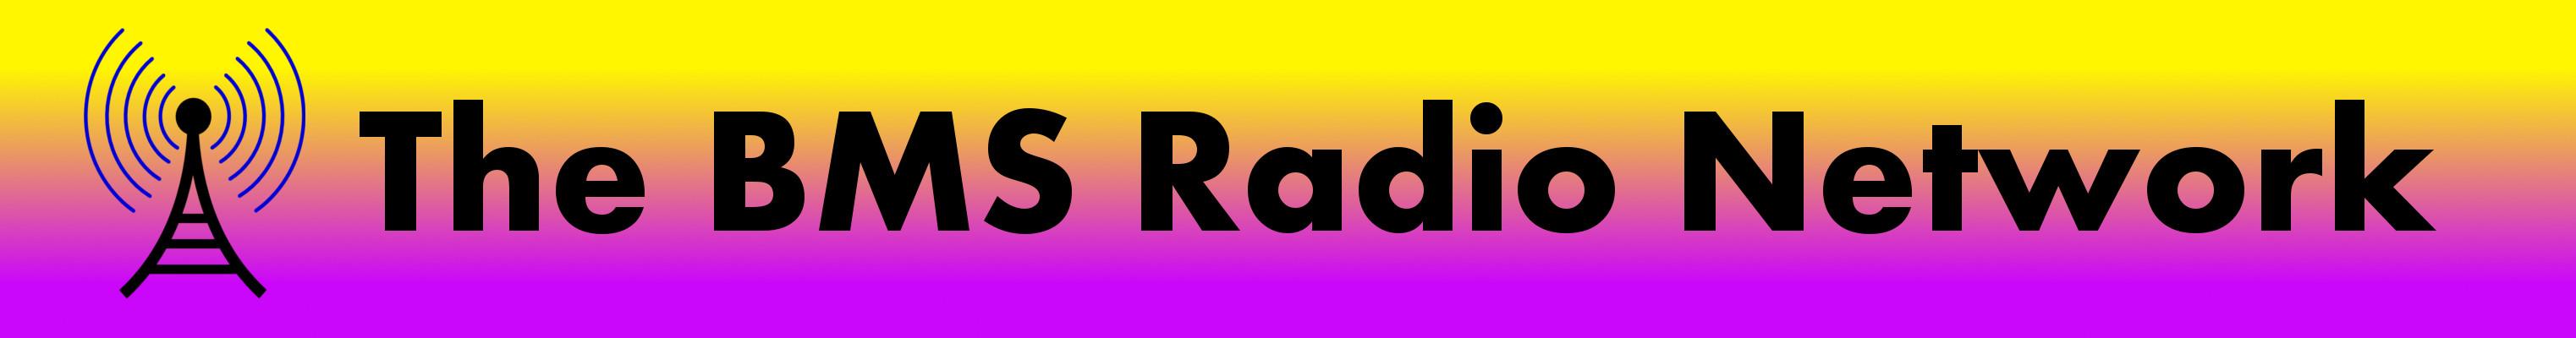 BMS Radio Network